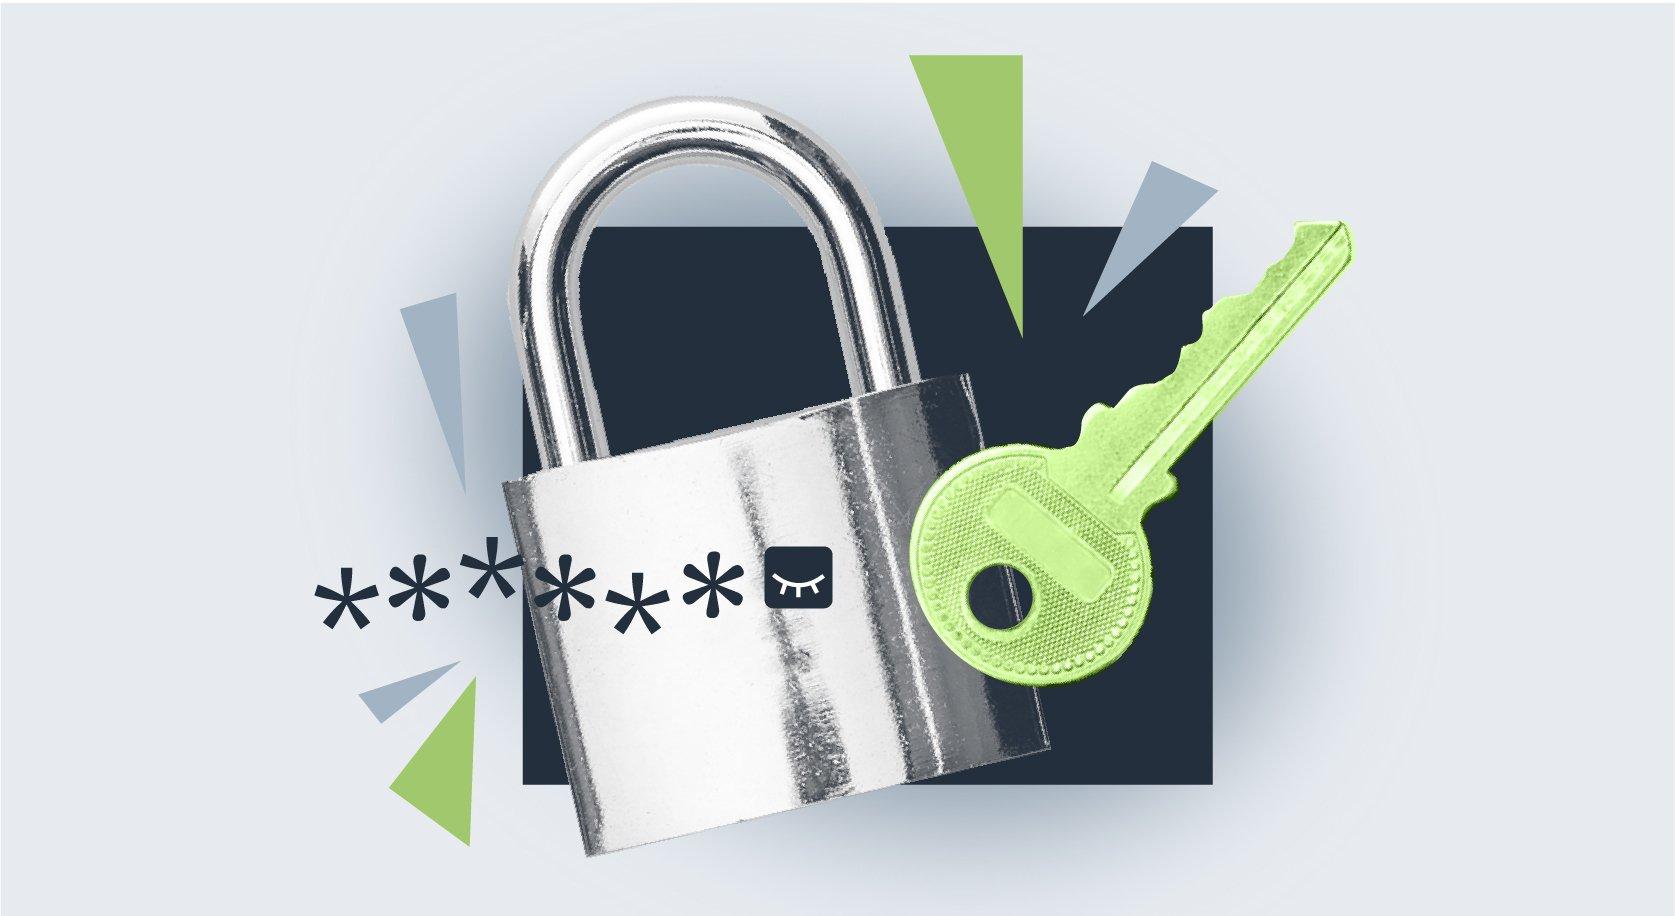 RC_Blog_SecureData_Header_v2